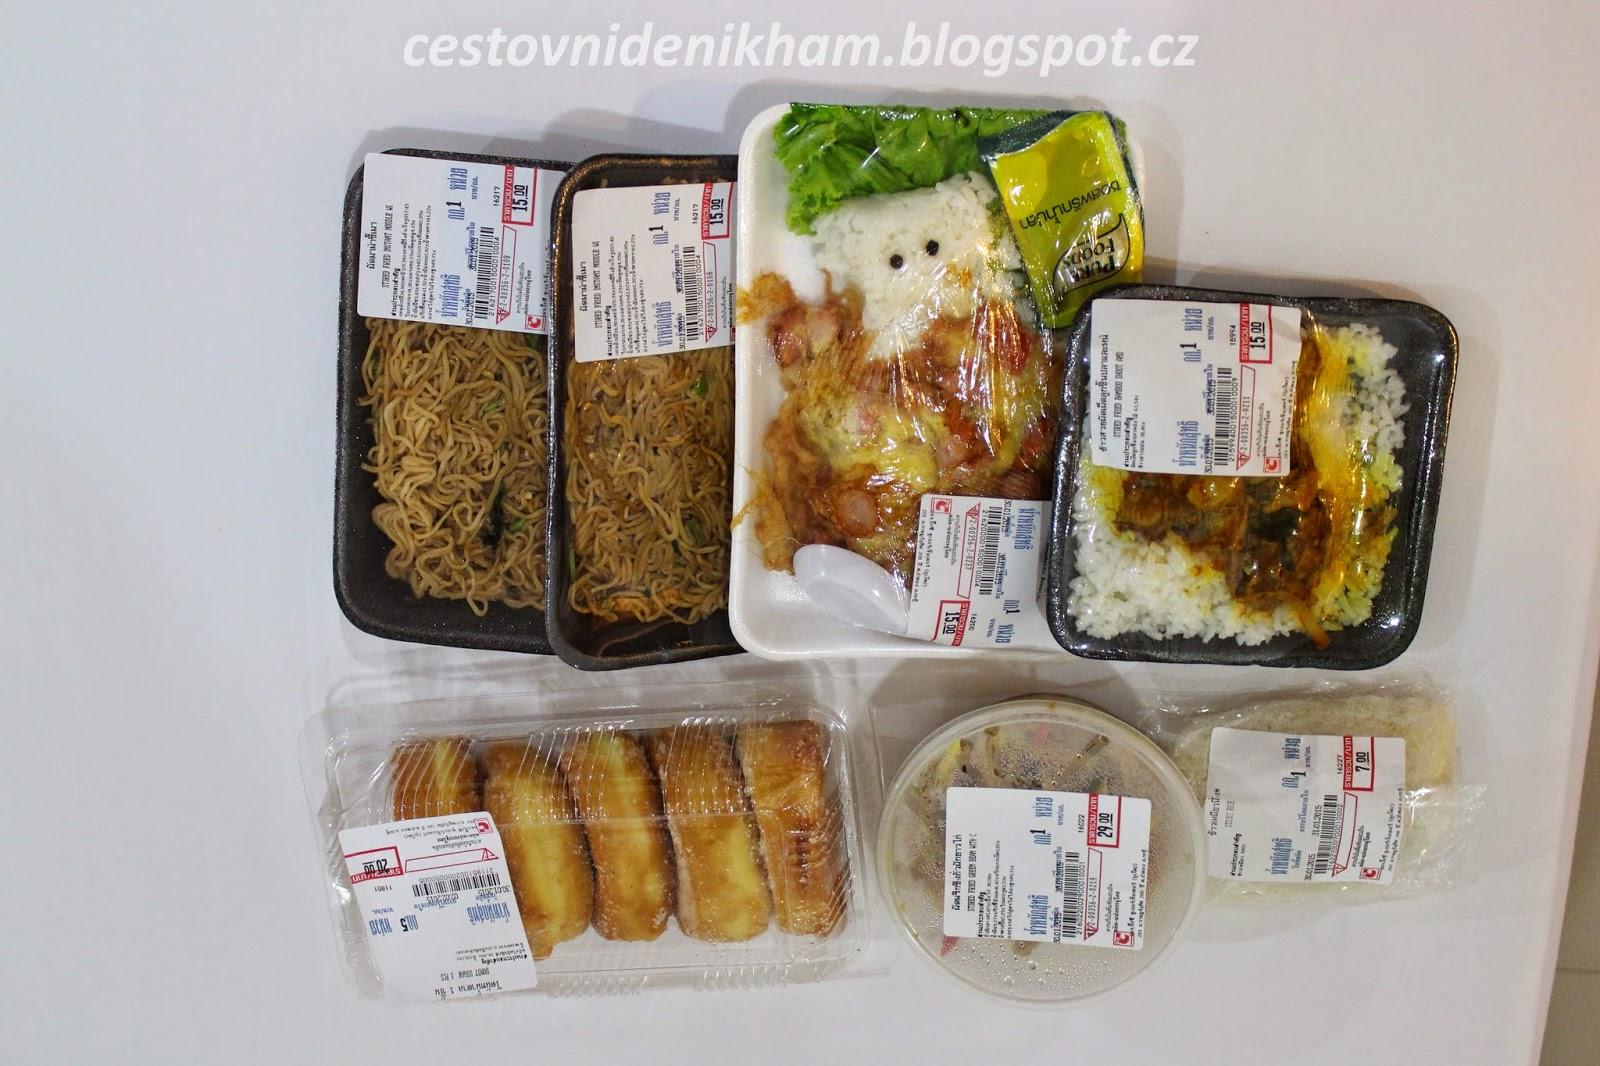 jídlo ze supermarketu Big C + méďa z rýže// local food from grocery shop Big C